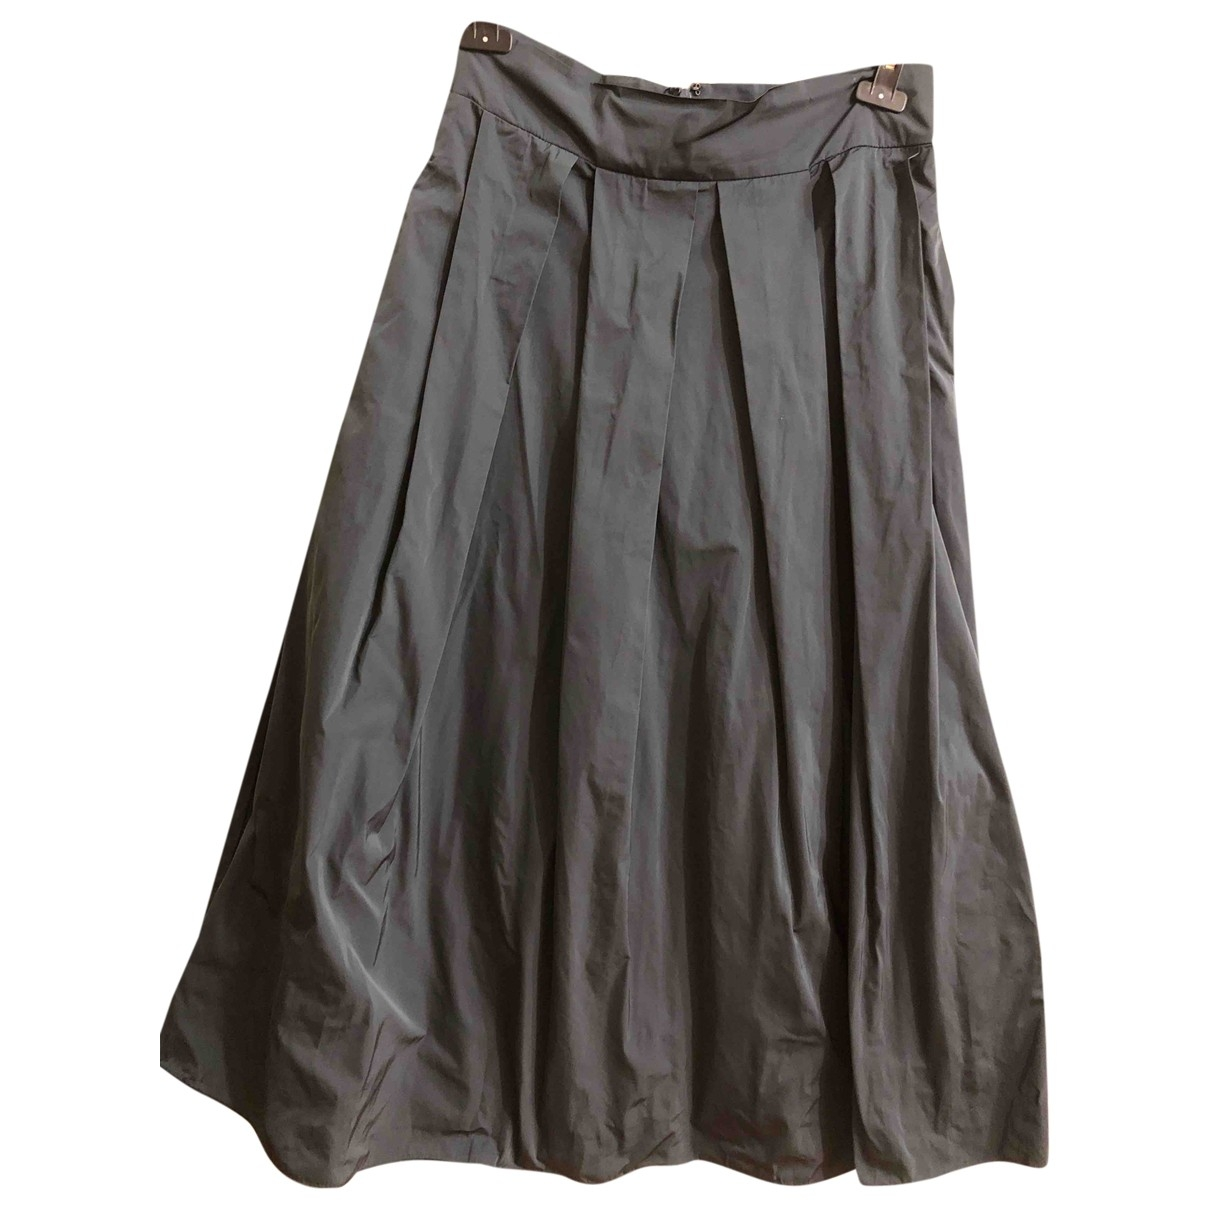 Max Mara 's \N Anthracite skirt for Women 46 IT